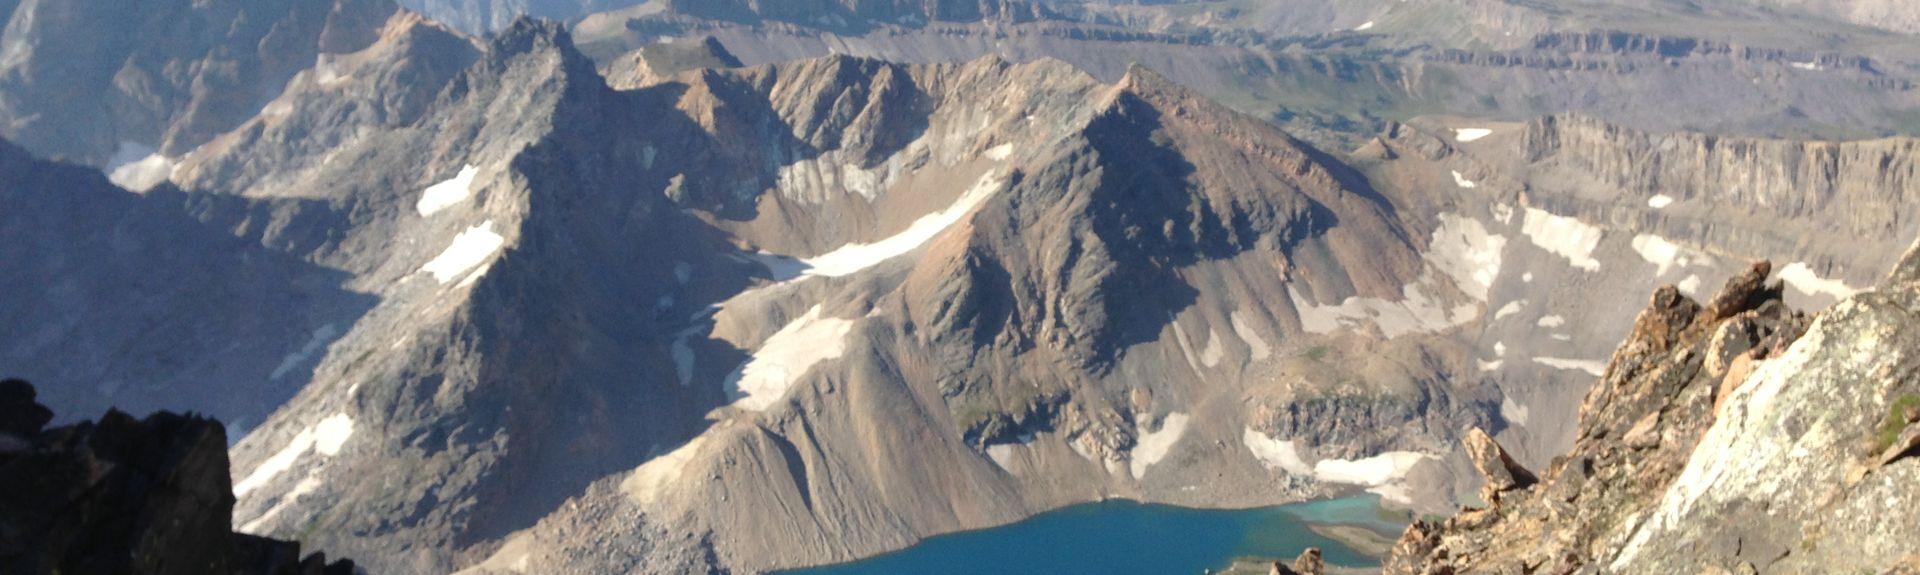 Alpine Slide of Jackson Hole, Jackson, Wyoming, Estados Unidos